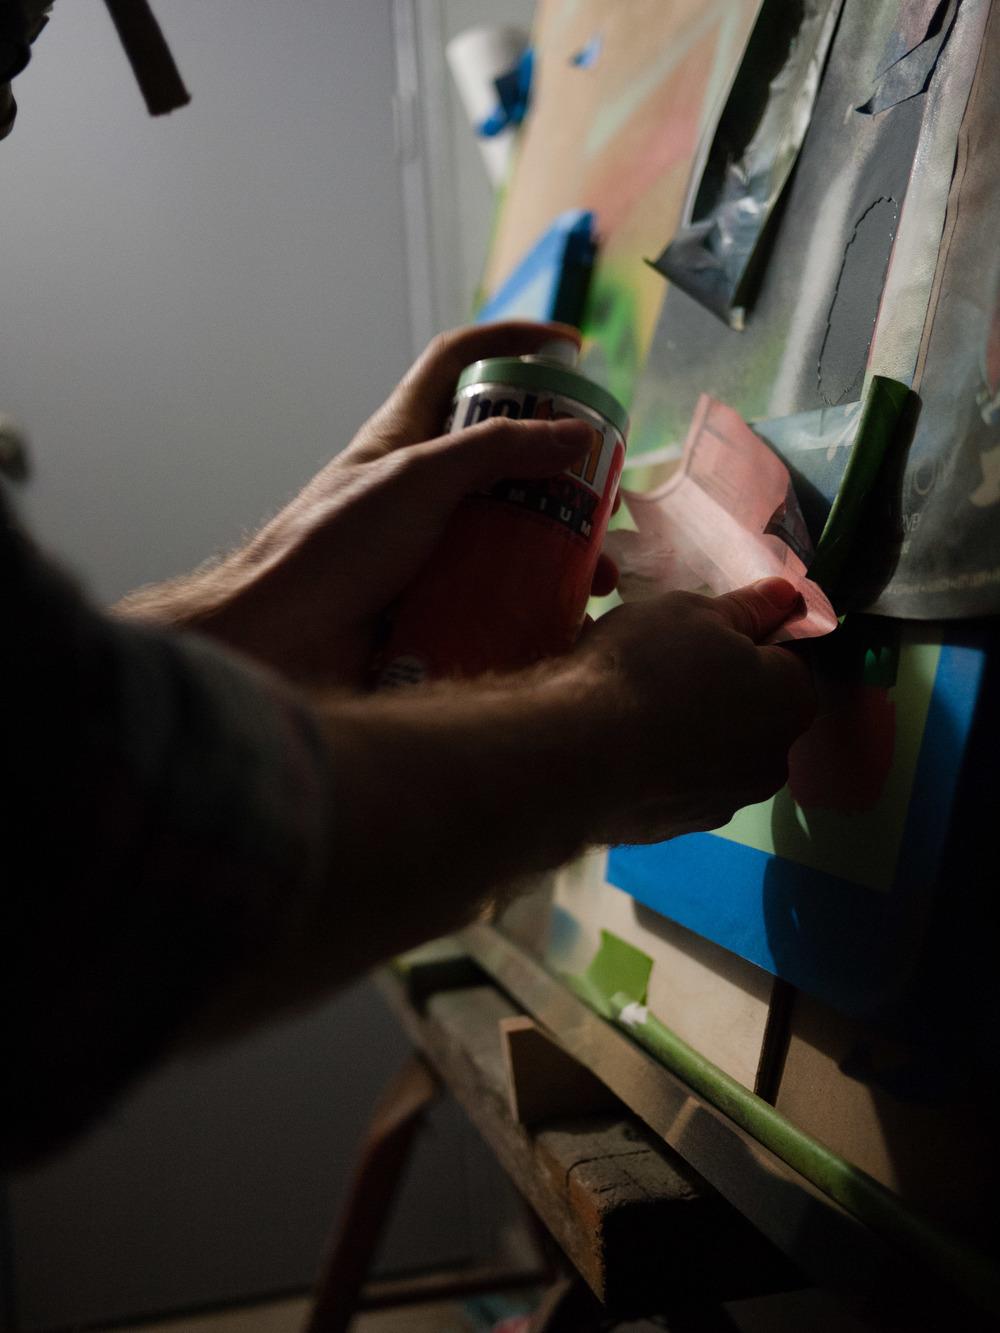 Australian artist studio visit, Melbourne artist - Ben Foster, The Corner Store Gallery, photograph by Emma Smallwood